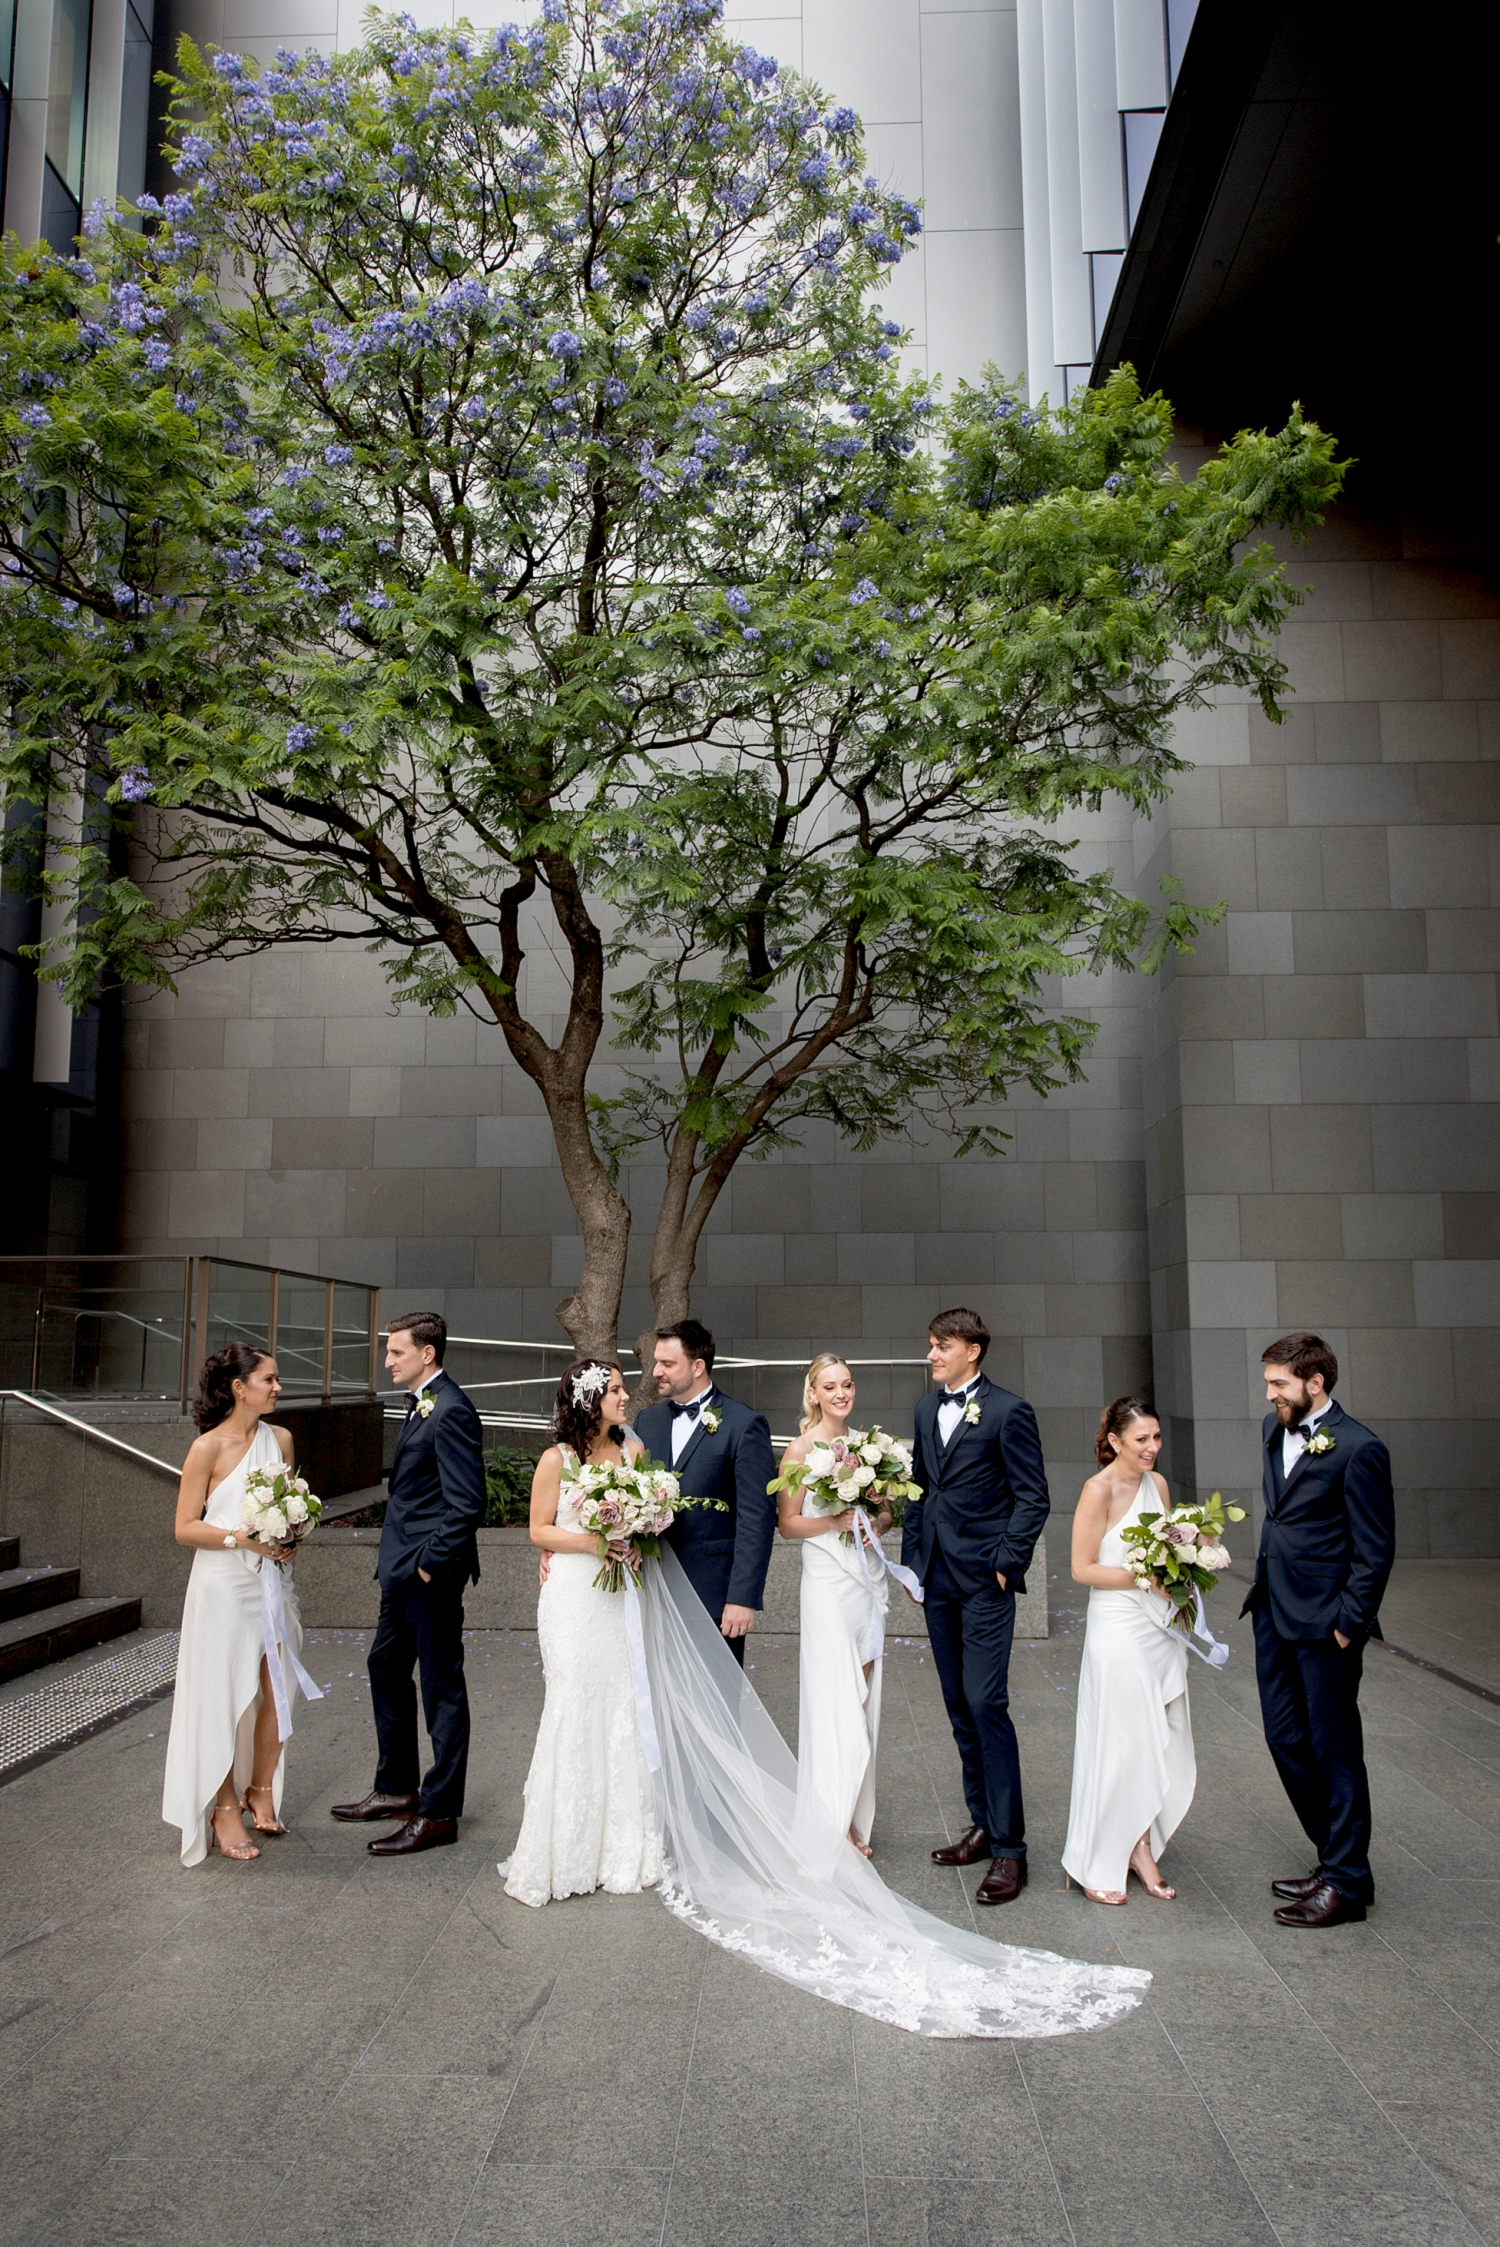 37_treasury buildings wedding photos perth.jpg